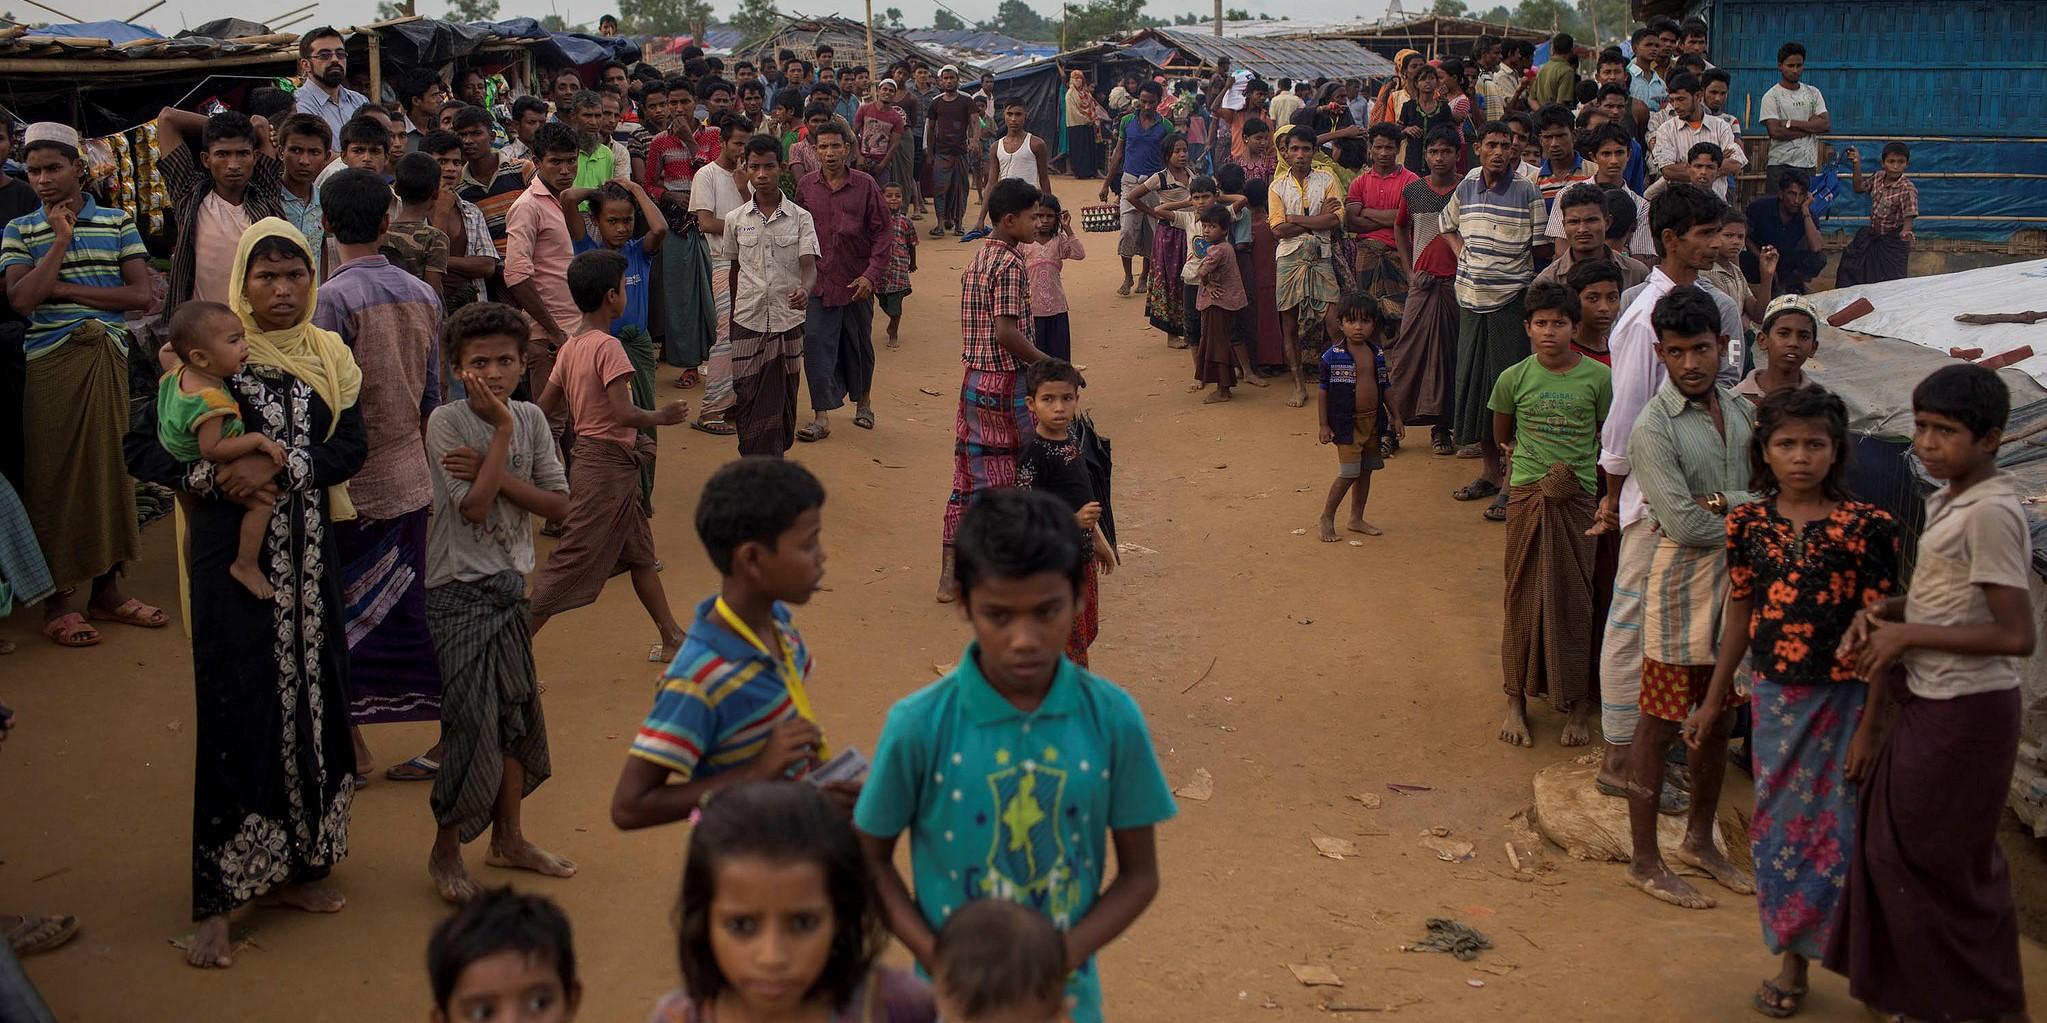 Rohingya in Bangladesh, October 2017 (Photo: EU/ECHO/Flickr)